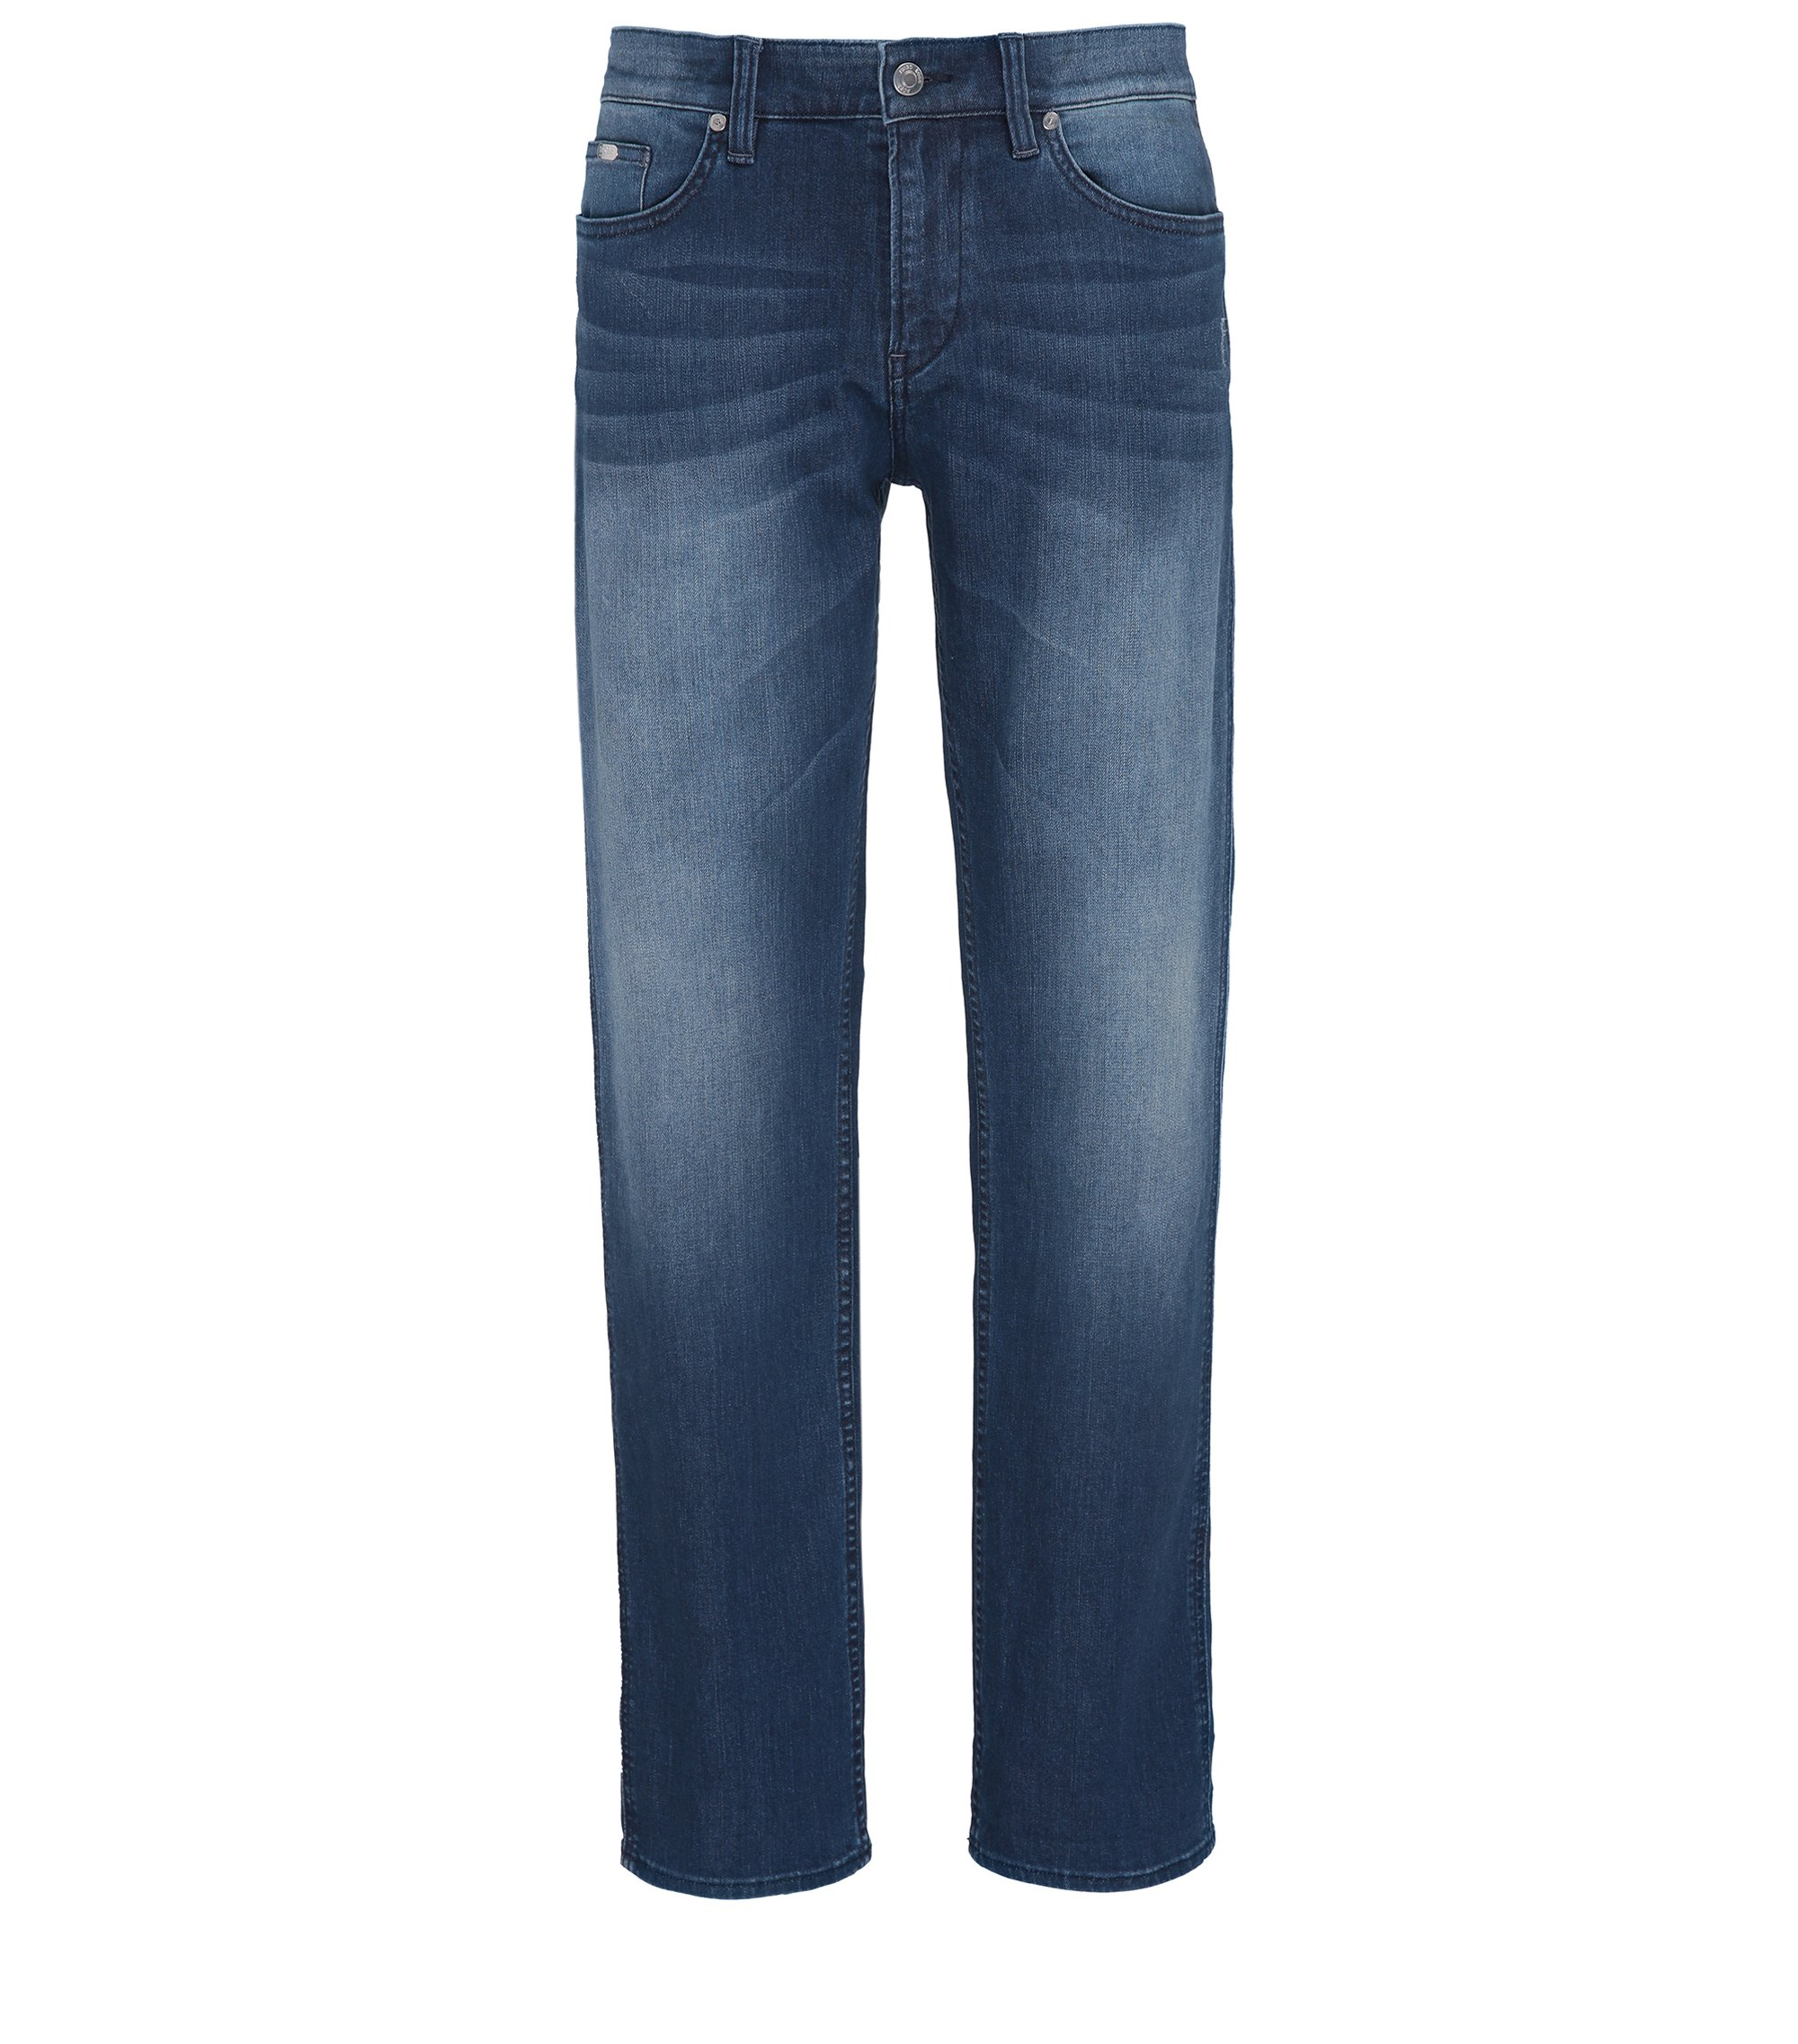 Slim-Fit Jeans aus komfortablem Stretch-Denim, Türkis